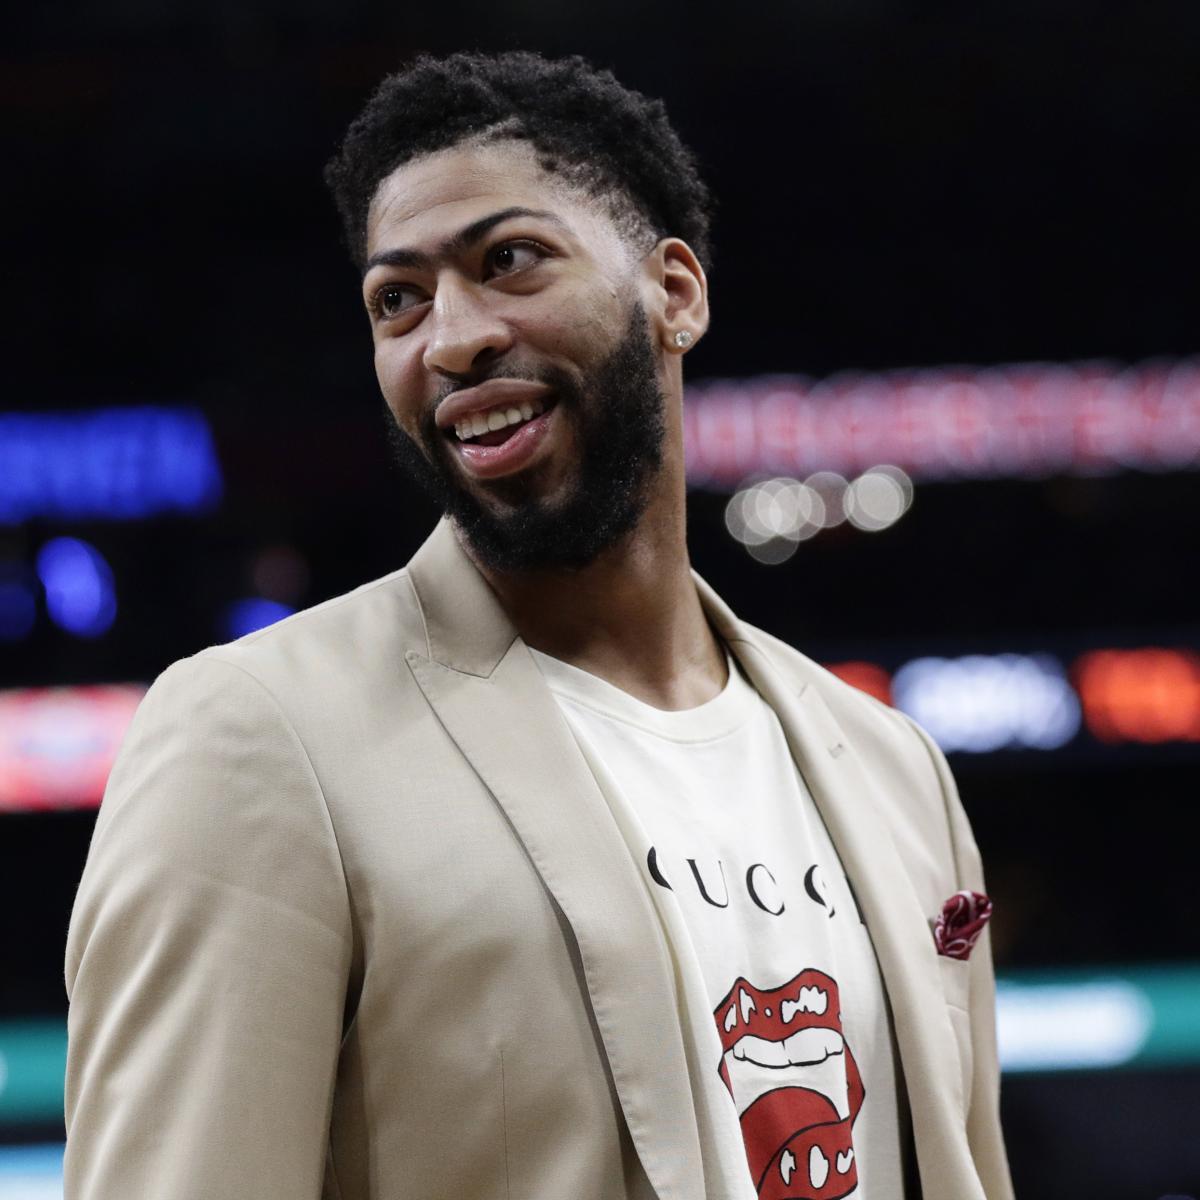 Bleacher Report Nba Staff S 2019 Playoff Predictions: B/R Staff Predictions For 2019 NBA Trade Deadline